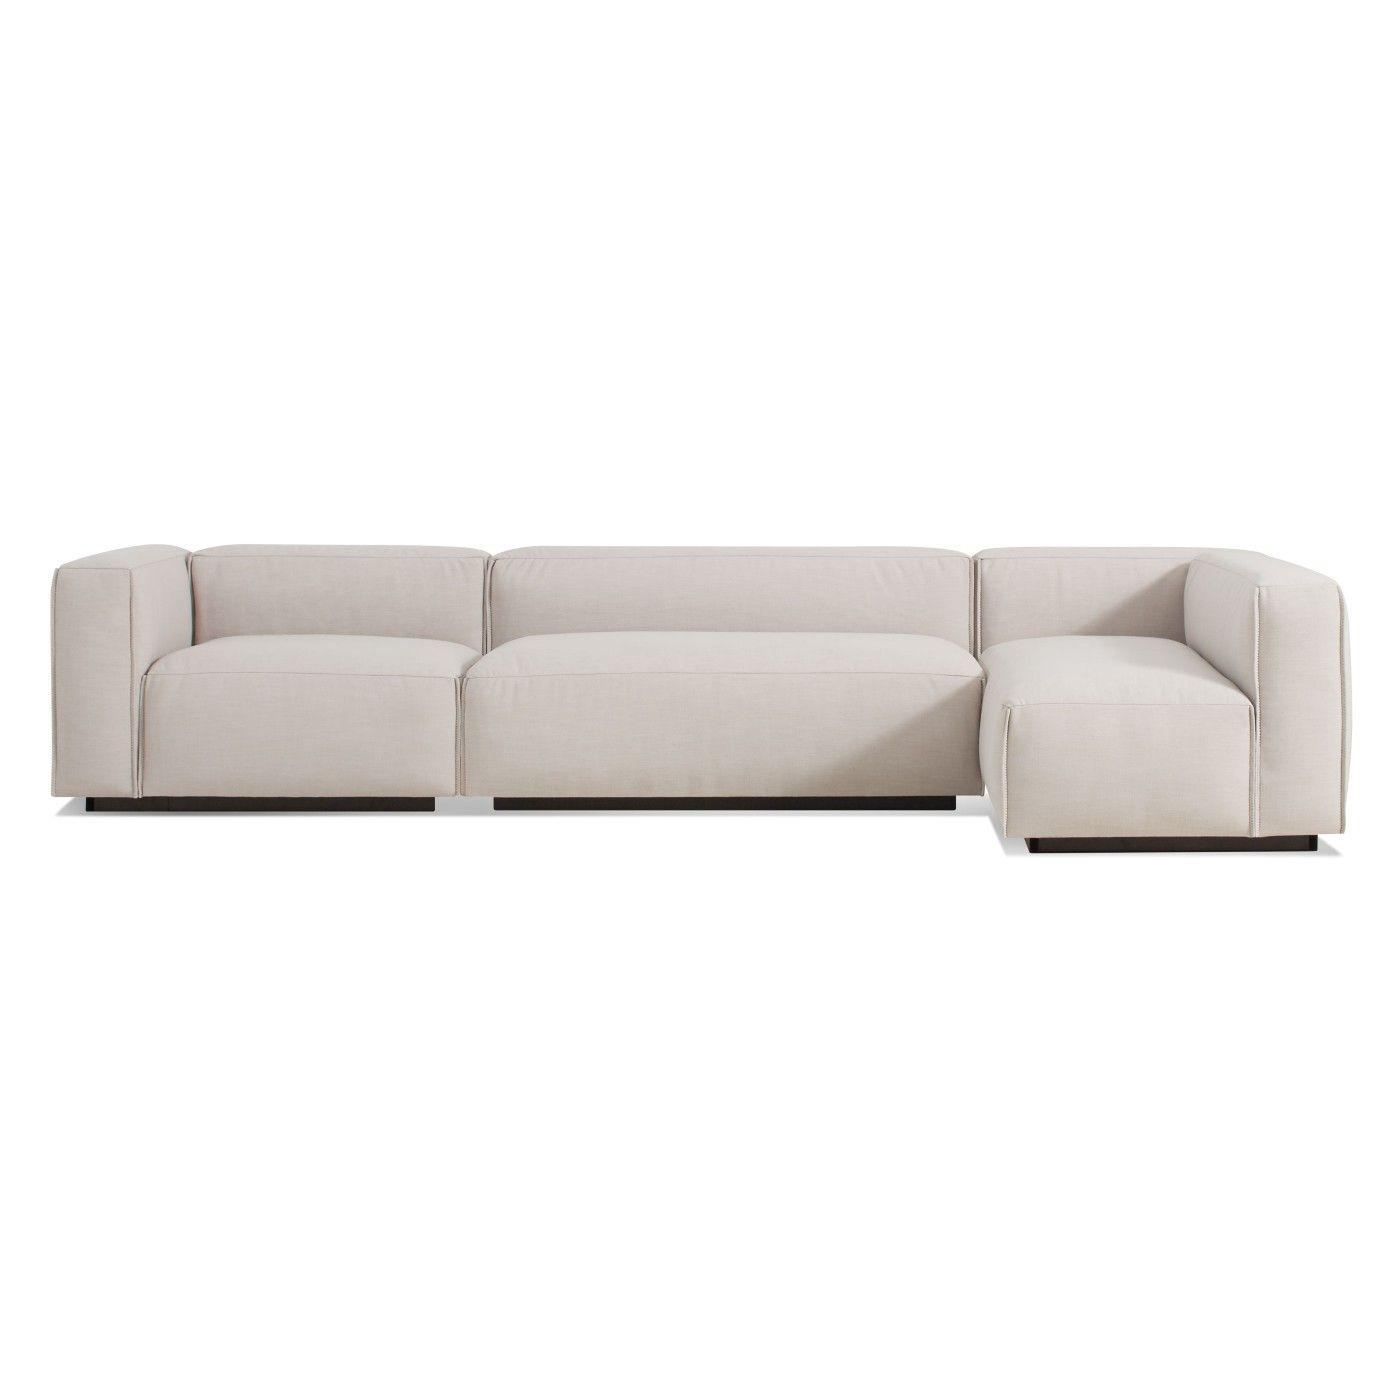 Blu Dot Cleon Medium+ Sectional Sofa   Craig Sand $3239.10 (trade Price)